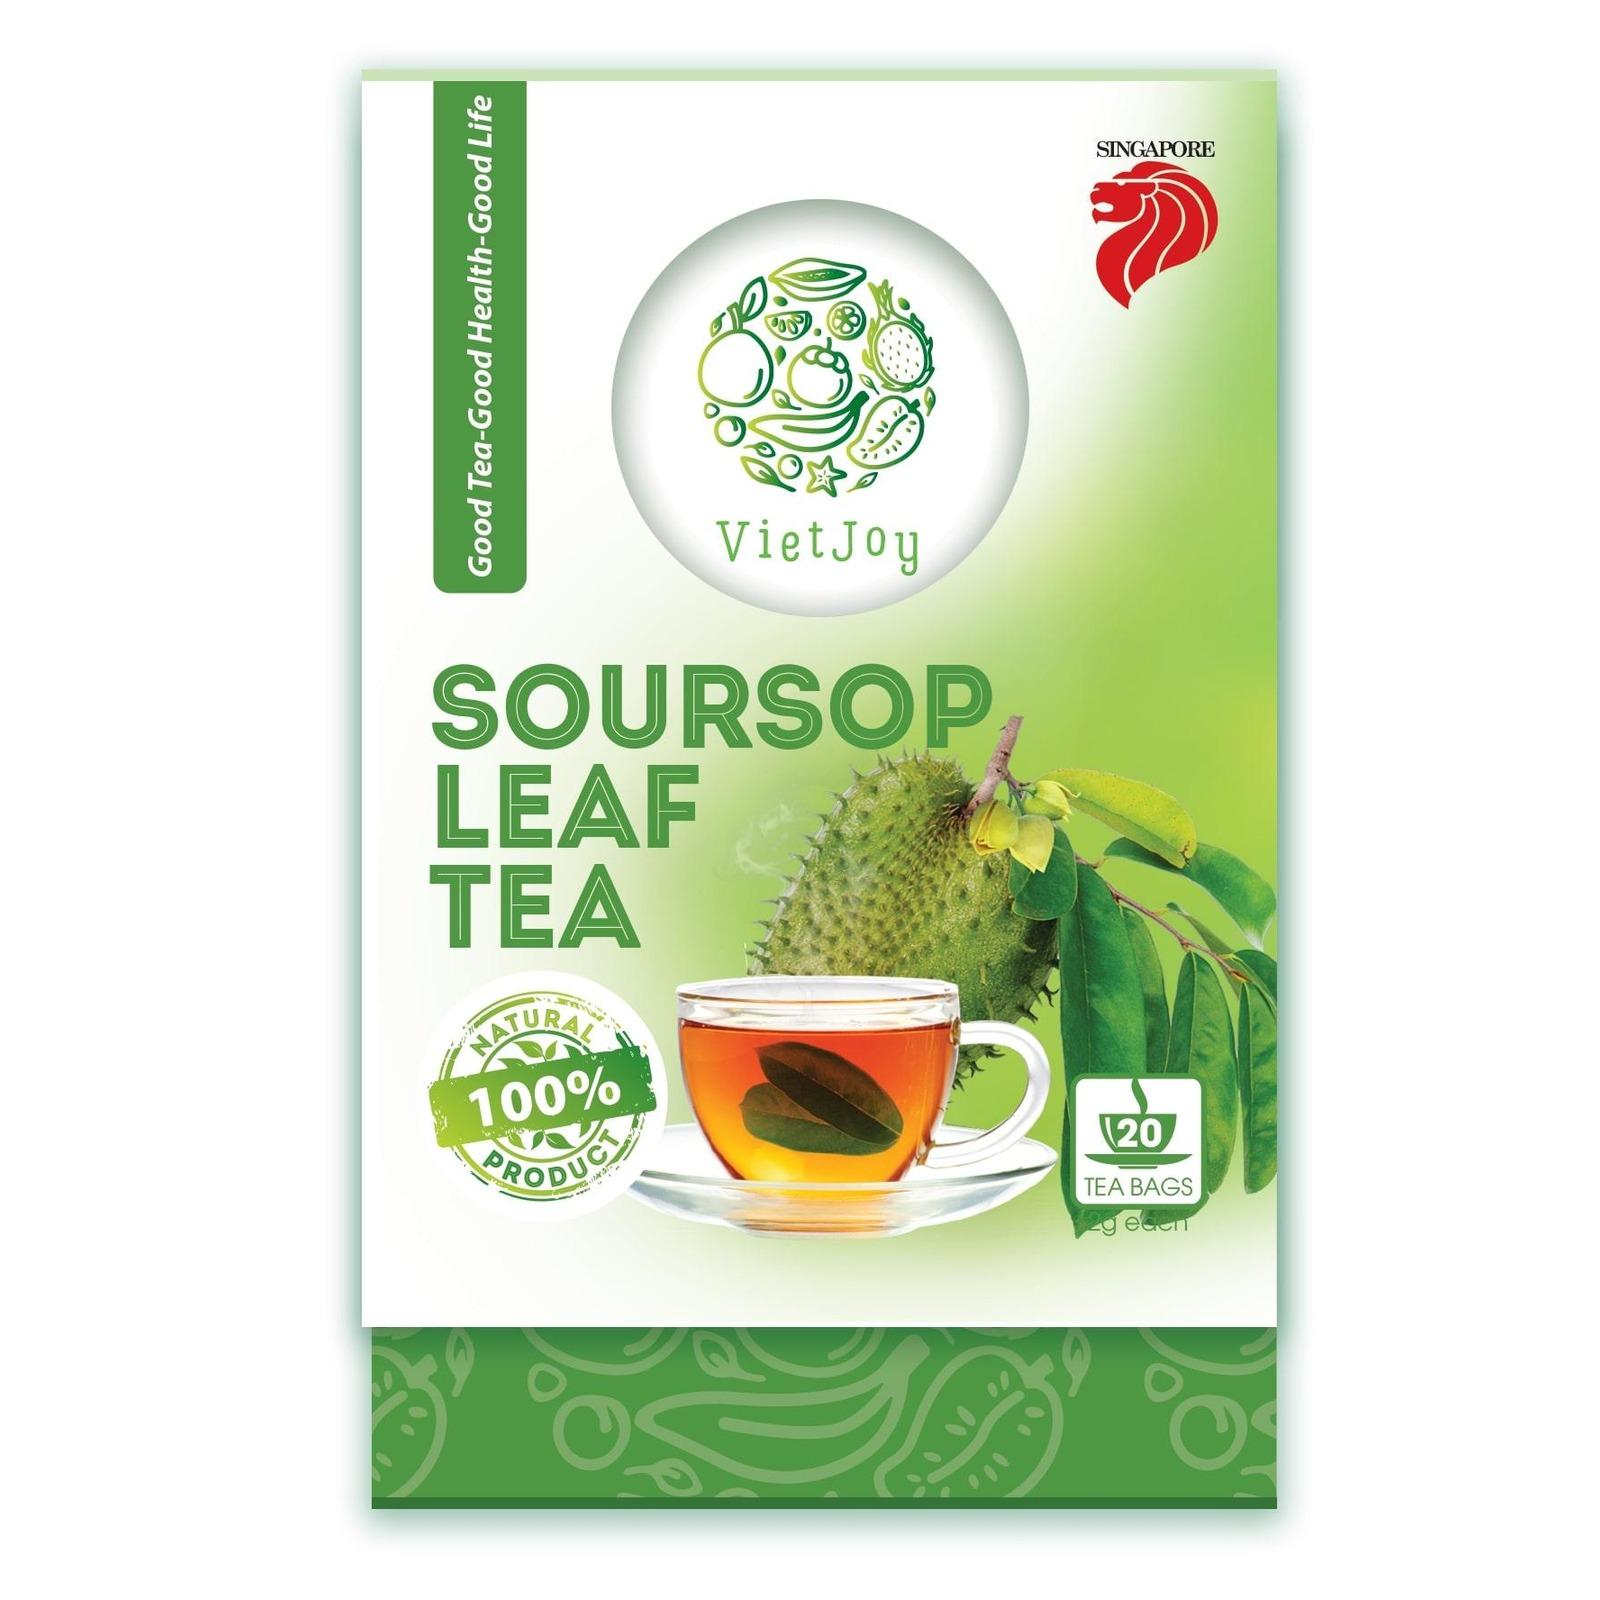 Vietjoy Soursop Leaf Tea